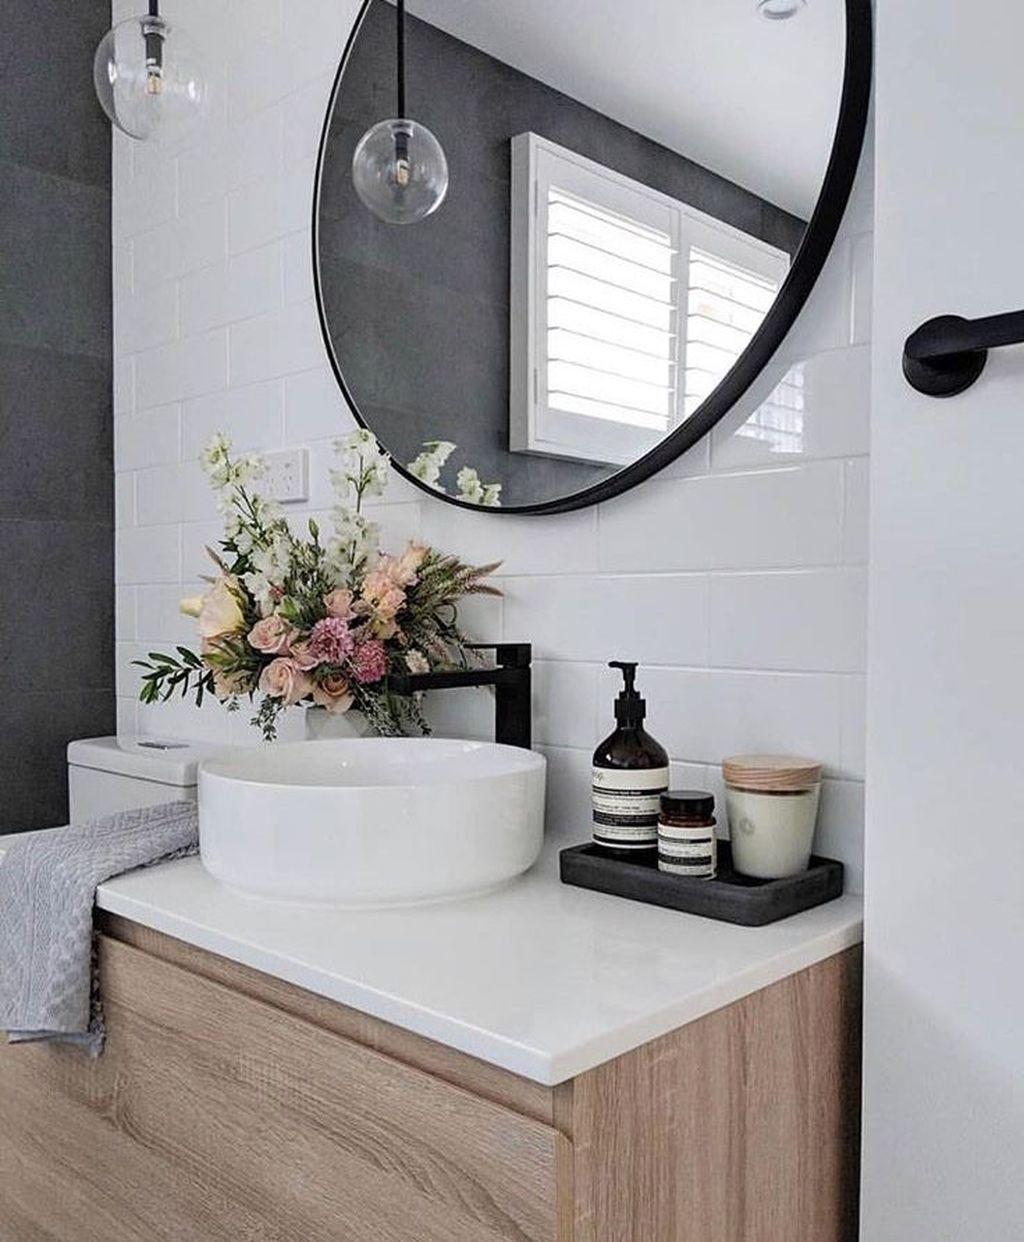 cool 47 cute but creative small bathroom décor ideas on cool small bathroom design ideas id=40123